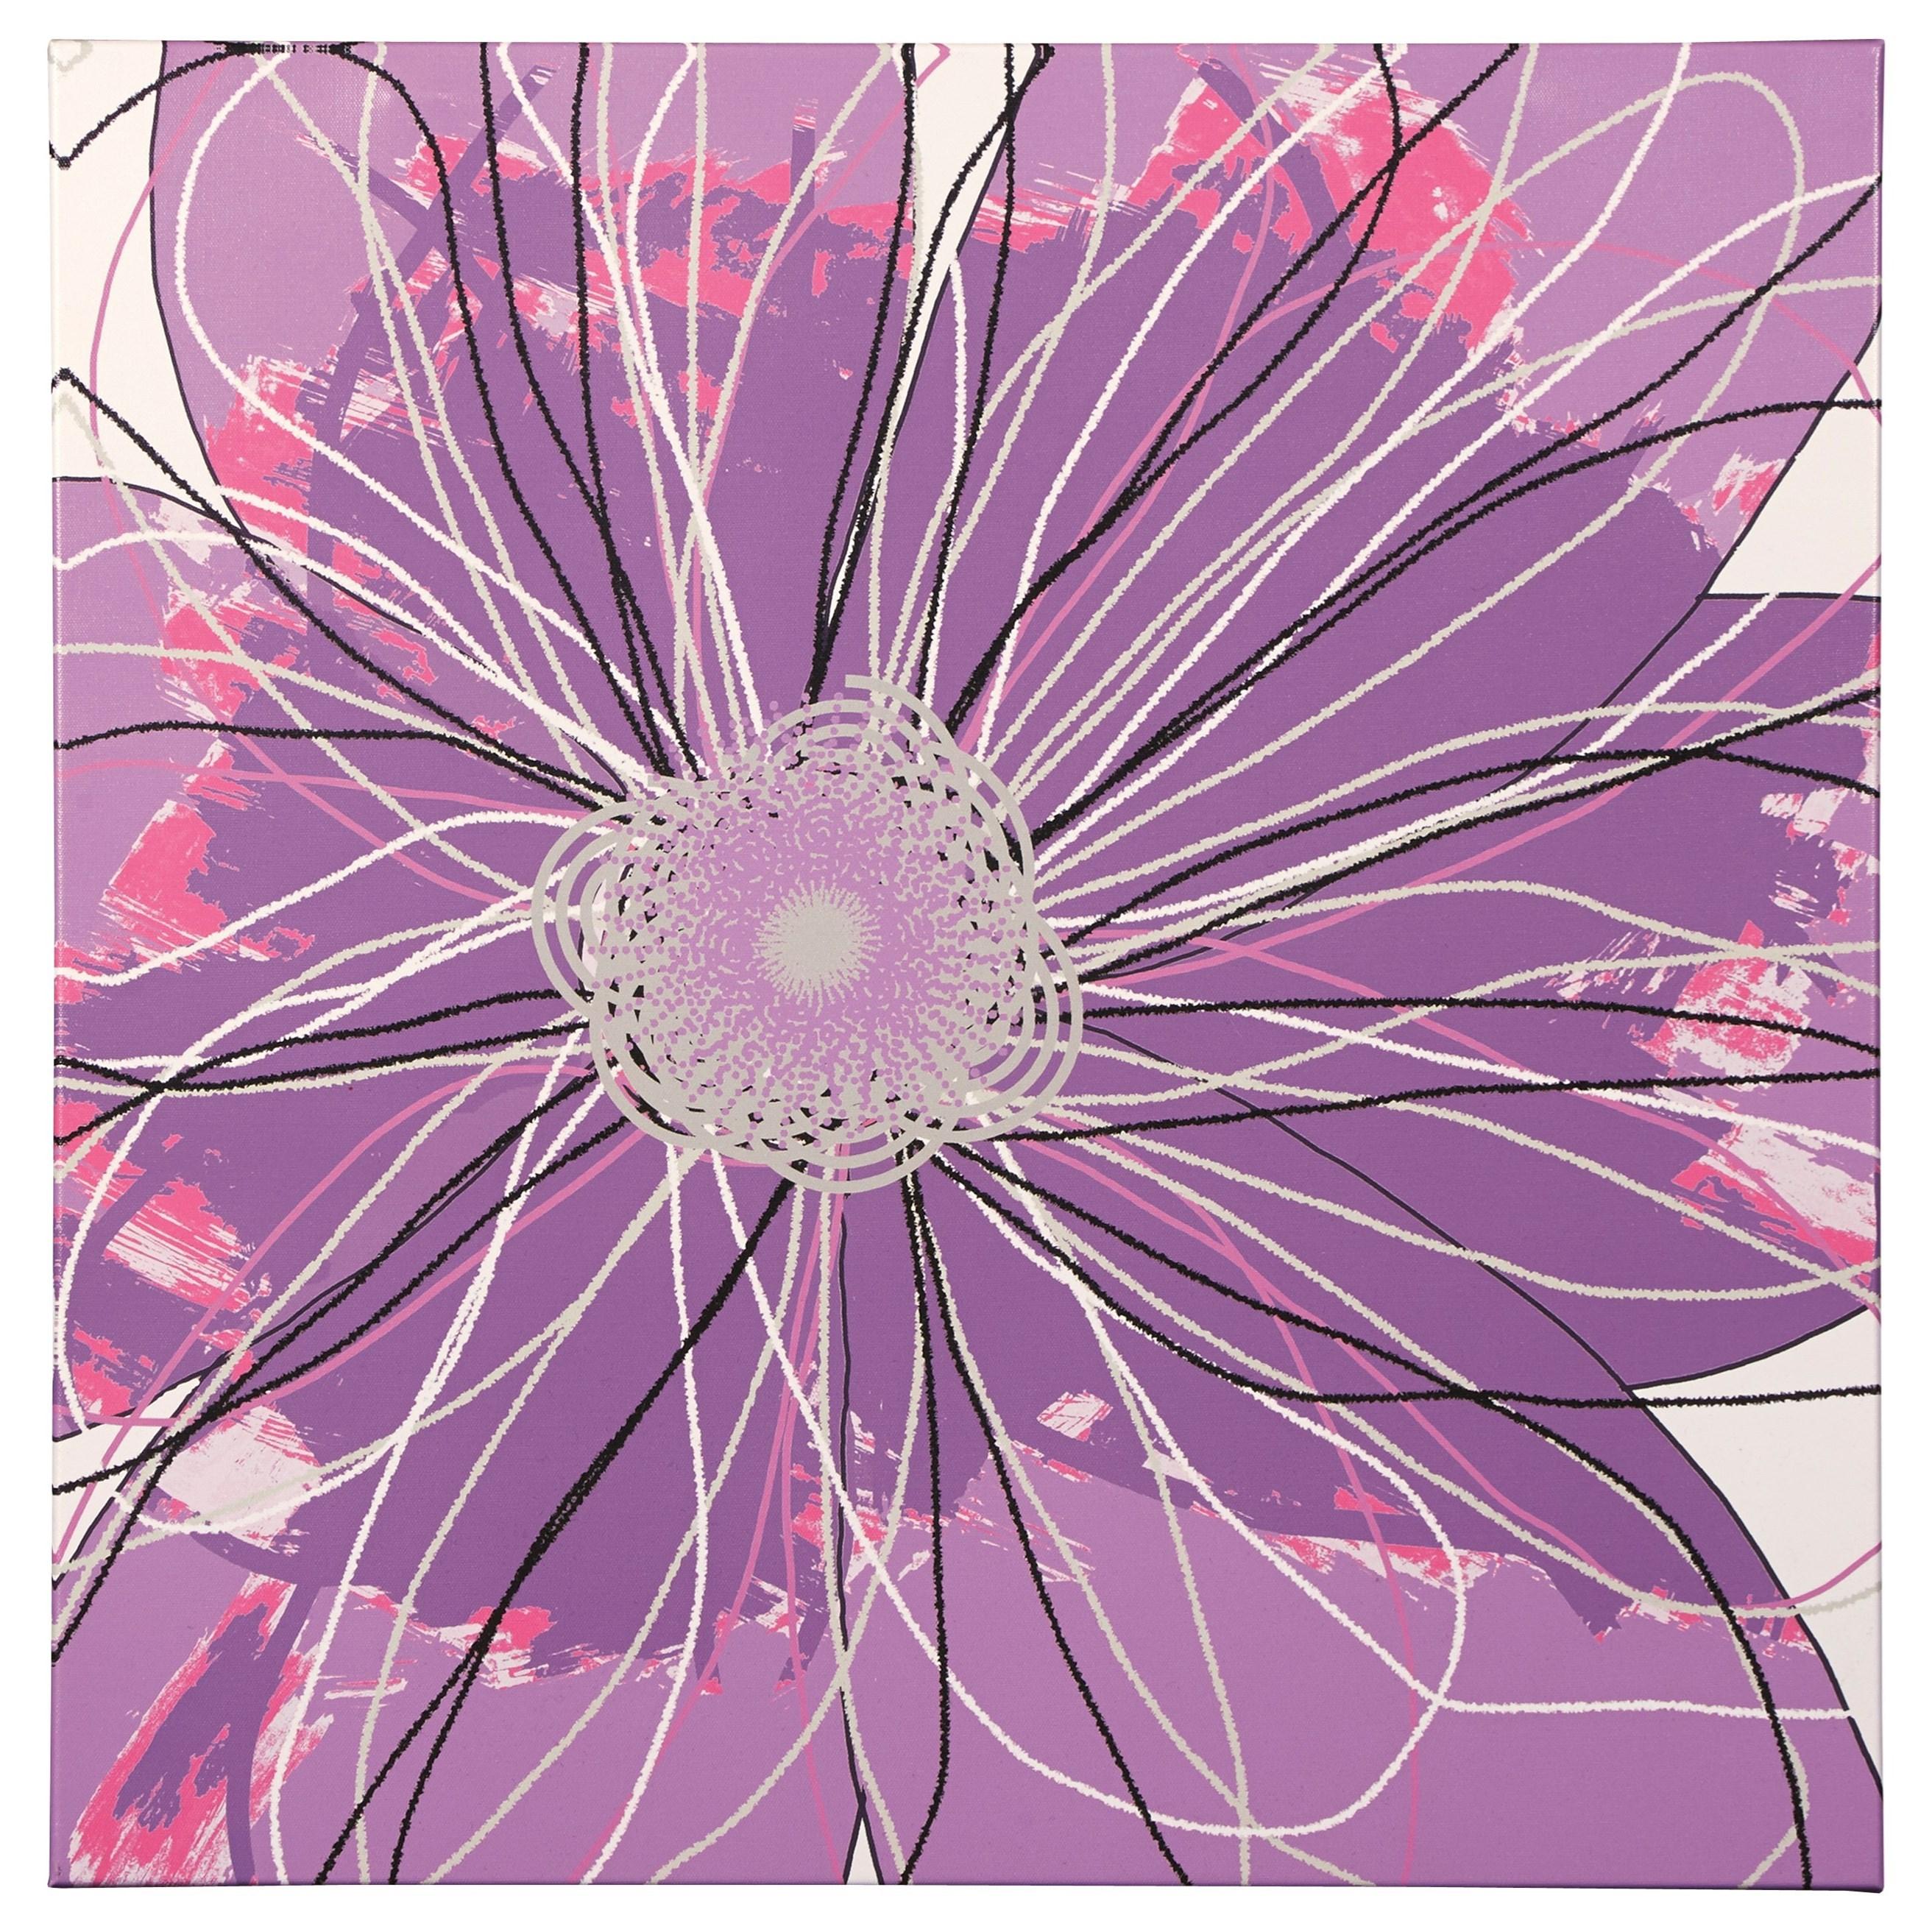 Signature Design by Ashley Wall Art Berdina Multi Wall Art - Item Number: A8000173